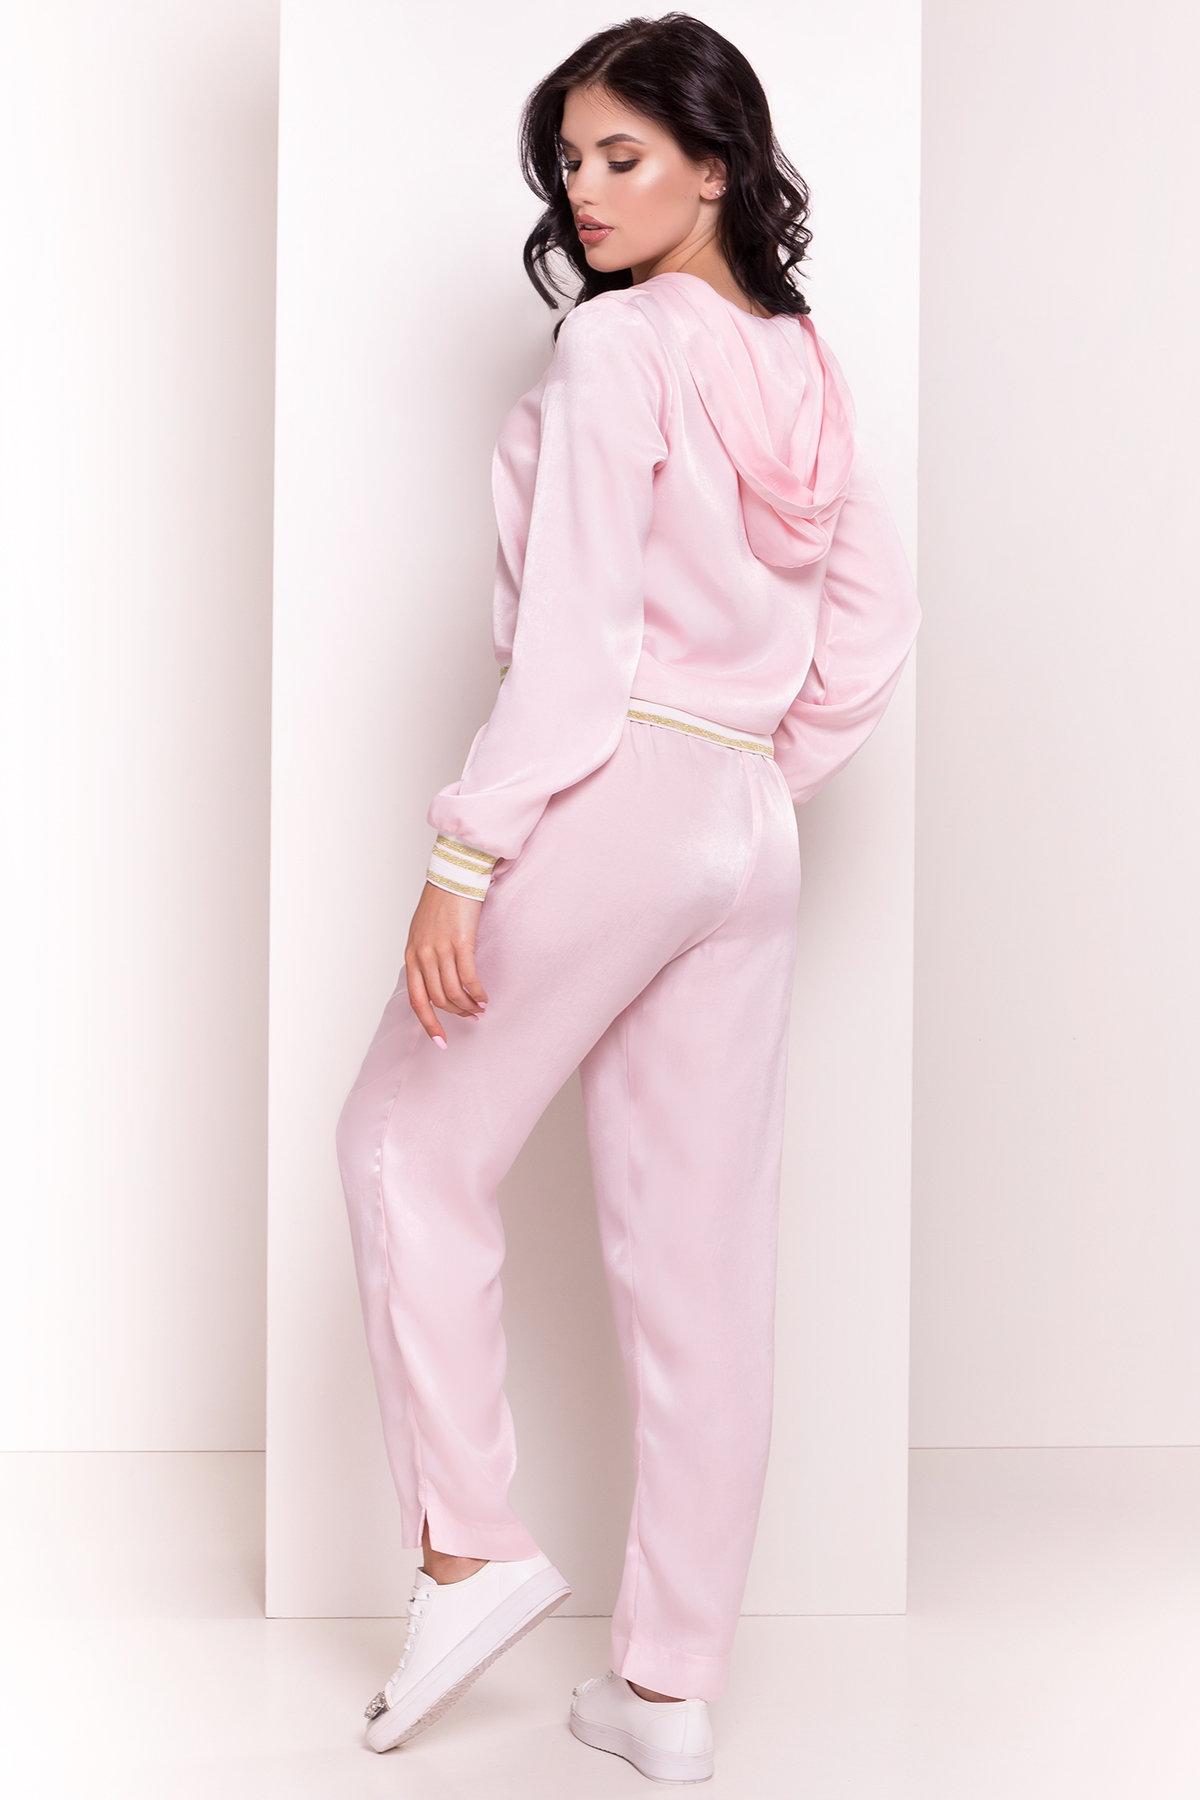 Бомбер Дина 4930 АРТ. 35519 Цвет: Розовый - фото 3, интернет магазин tm-modus.ru